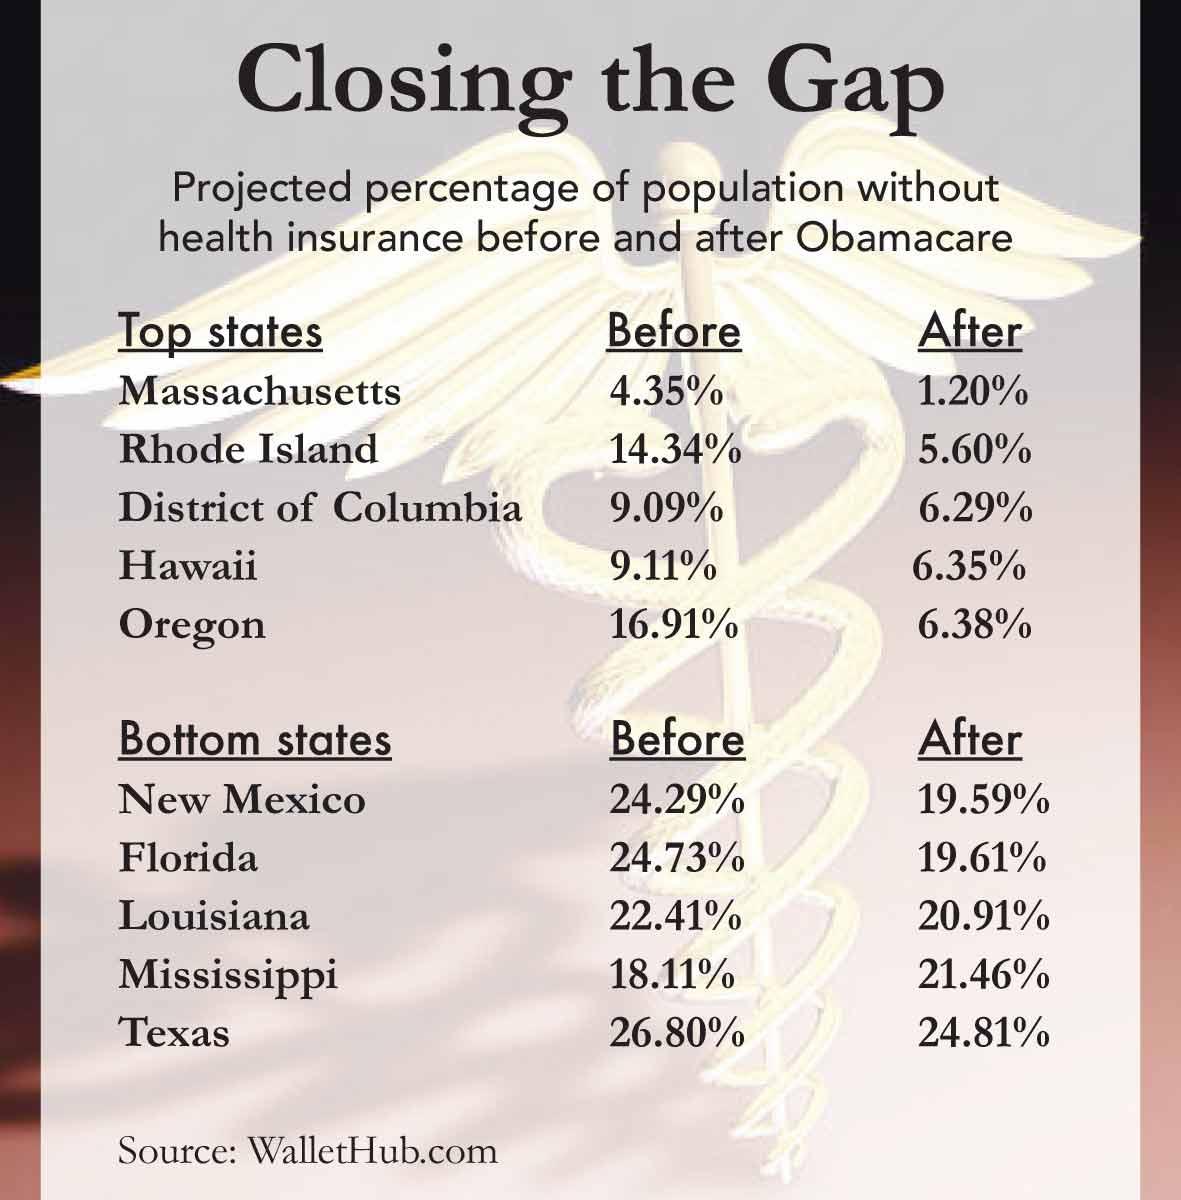 Obamacare paradox in Florida